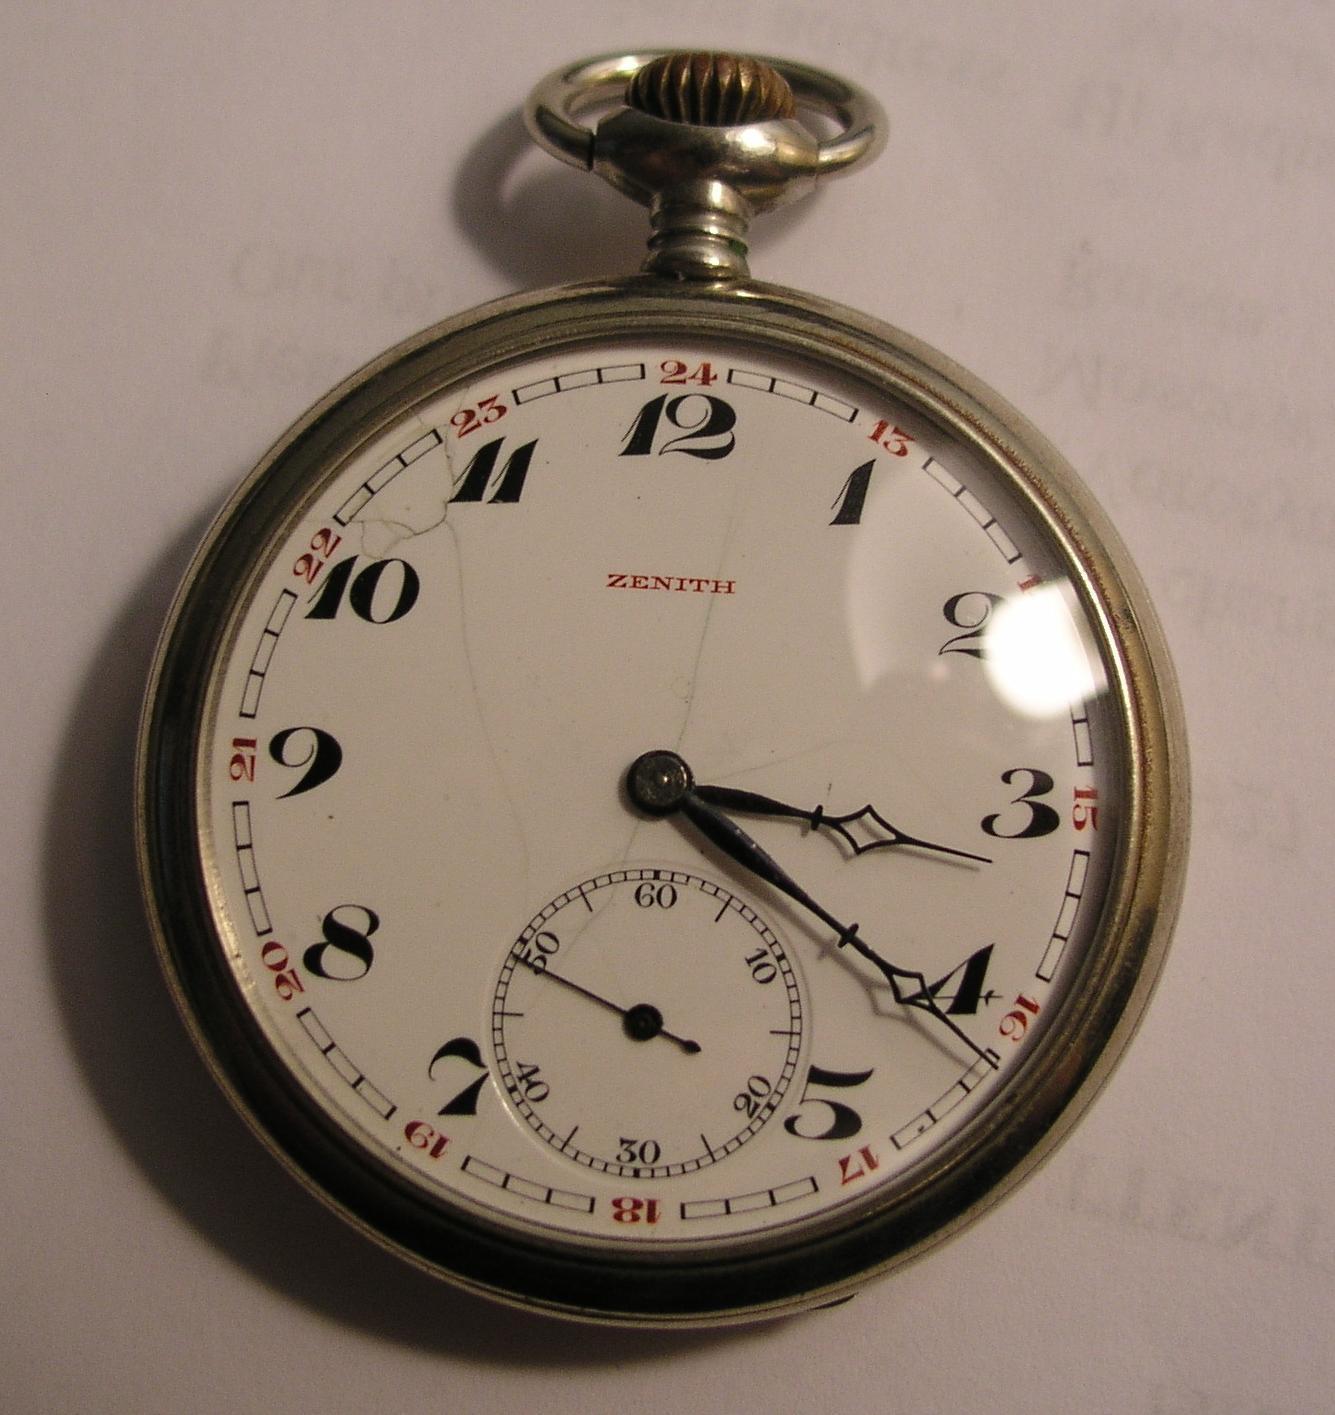 ... карманные часы ZENITH ~1910 года: german242.com/w/Zenith1/Zenith1.htm